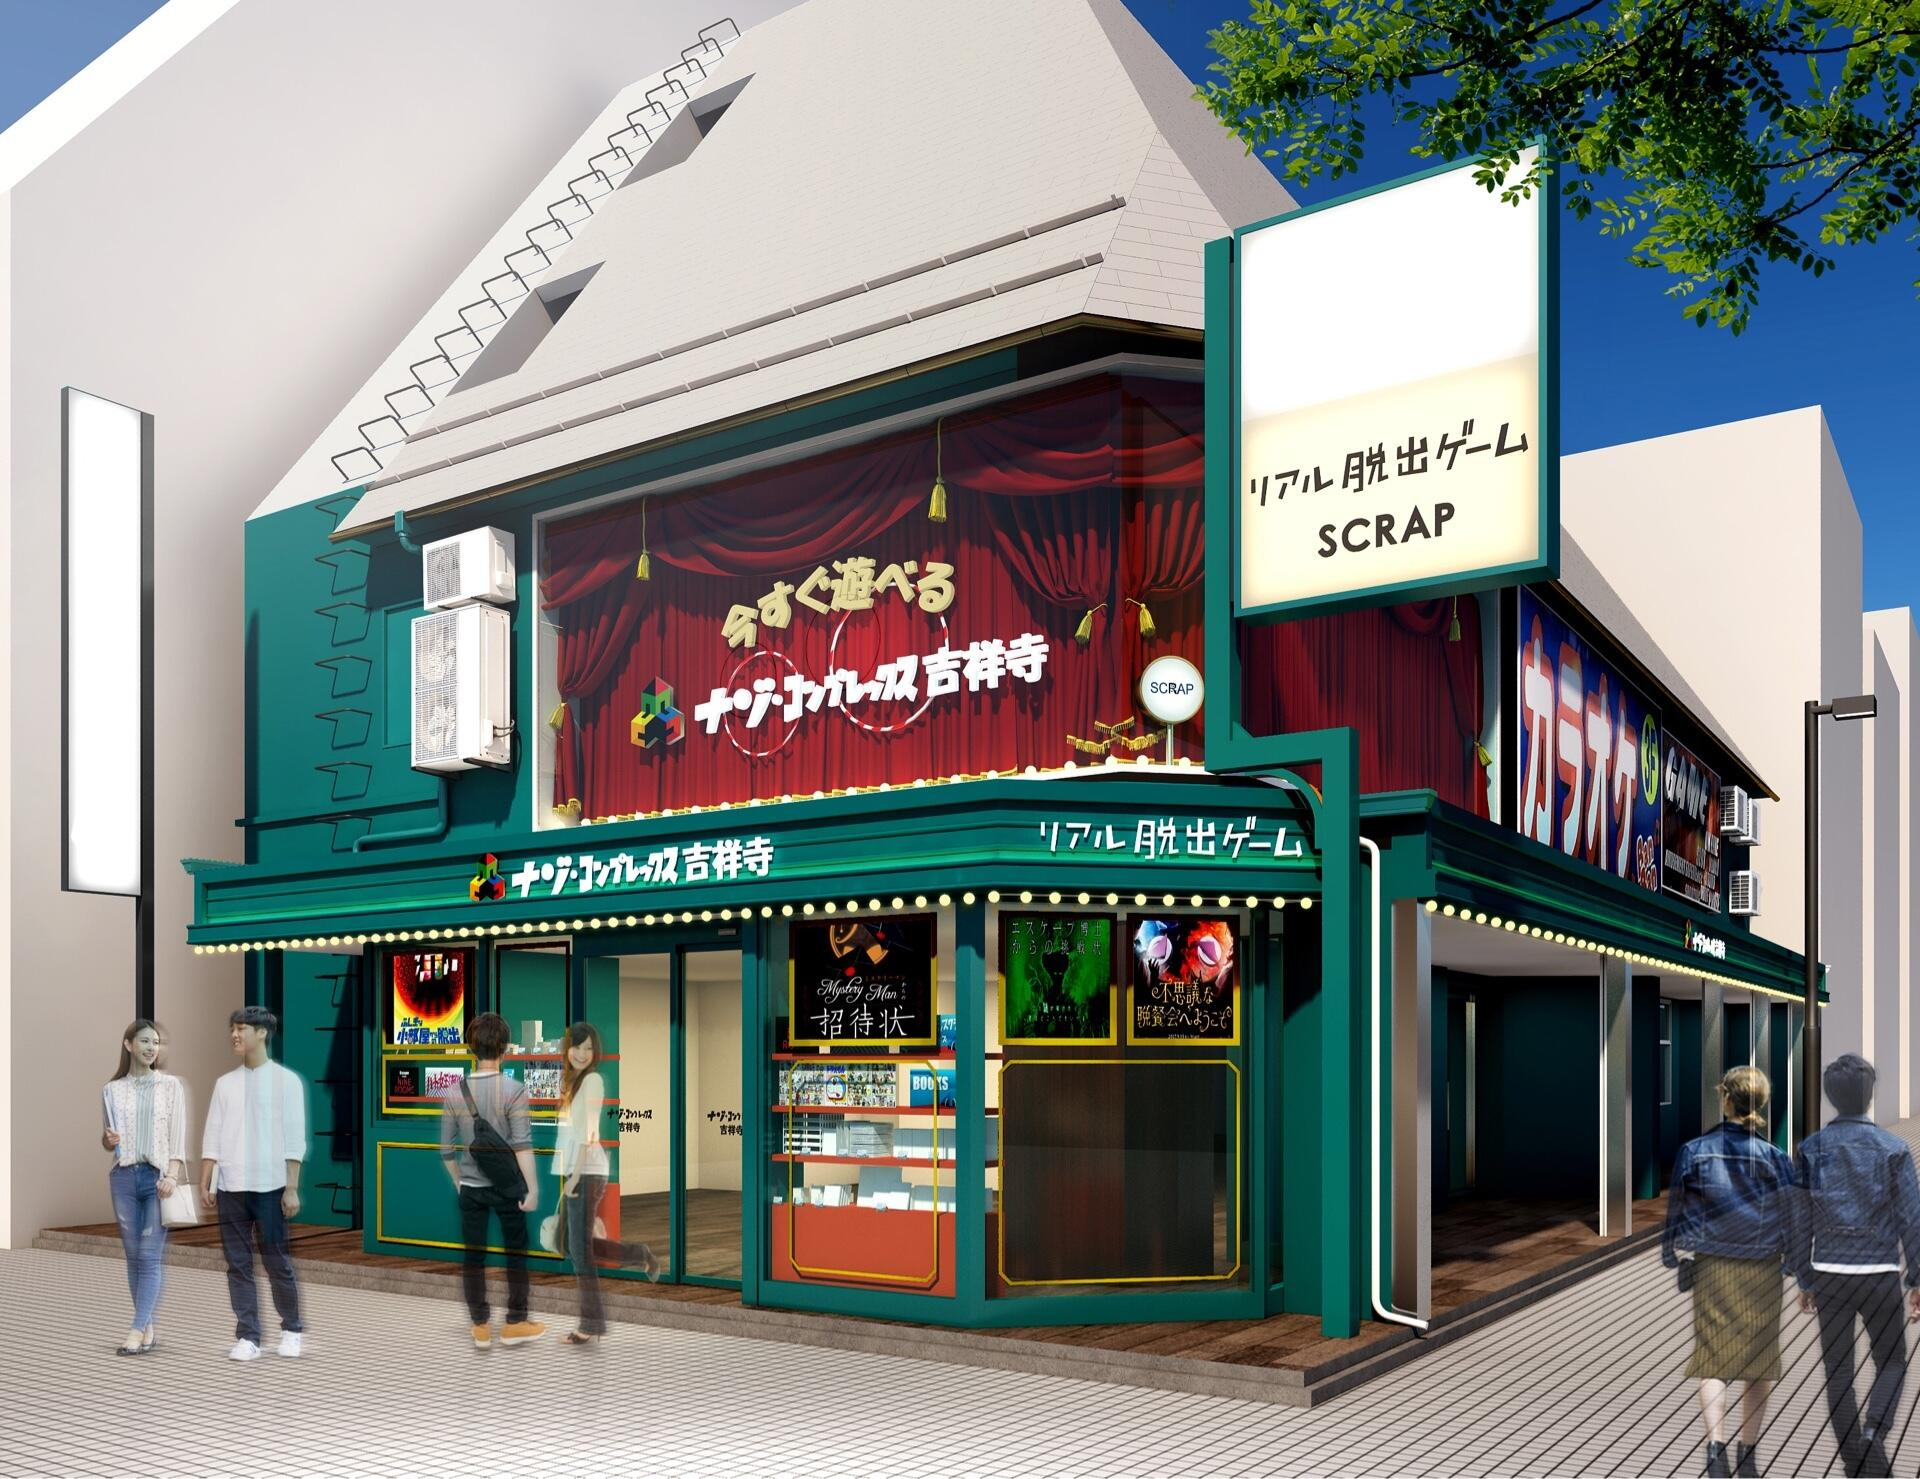 NAZO BLDG. by SCRAP<br> in Kichijoji